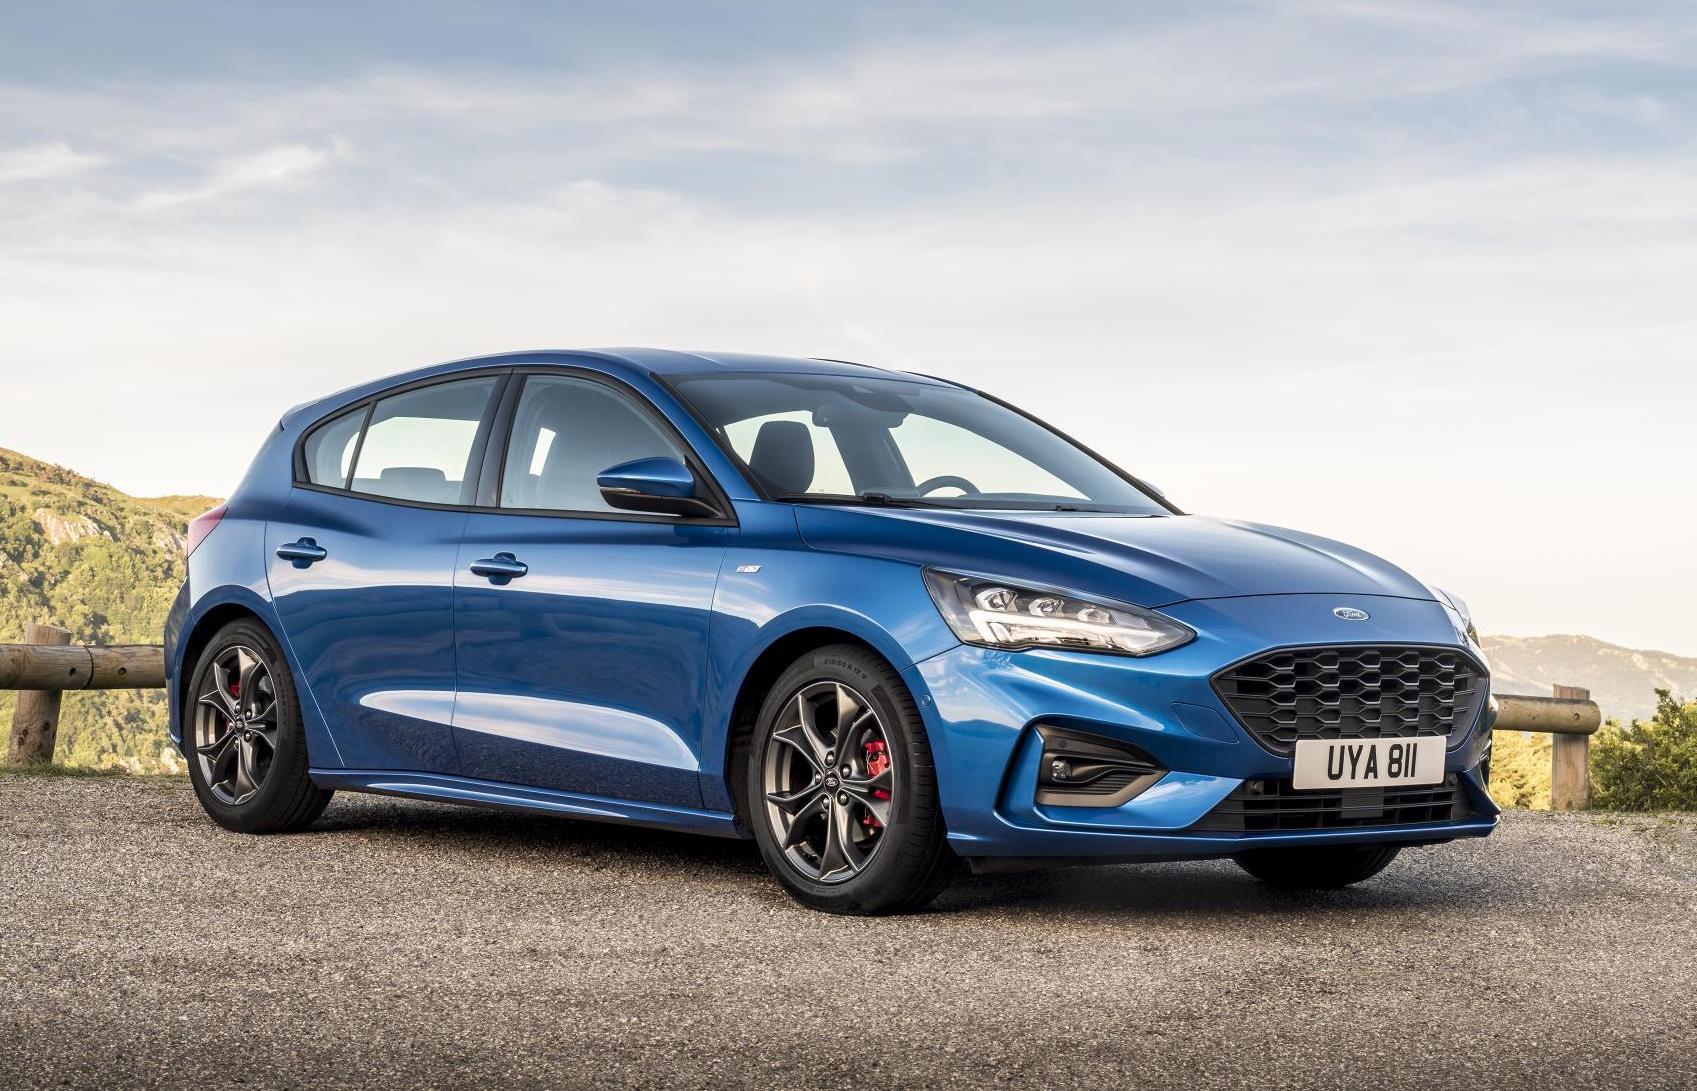 2019 Focus St >> 2019 Ford Focus Australian details announced, ST-Line confirmed | PerformanceDrive